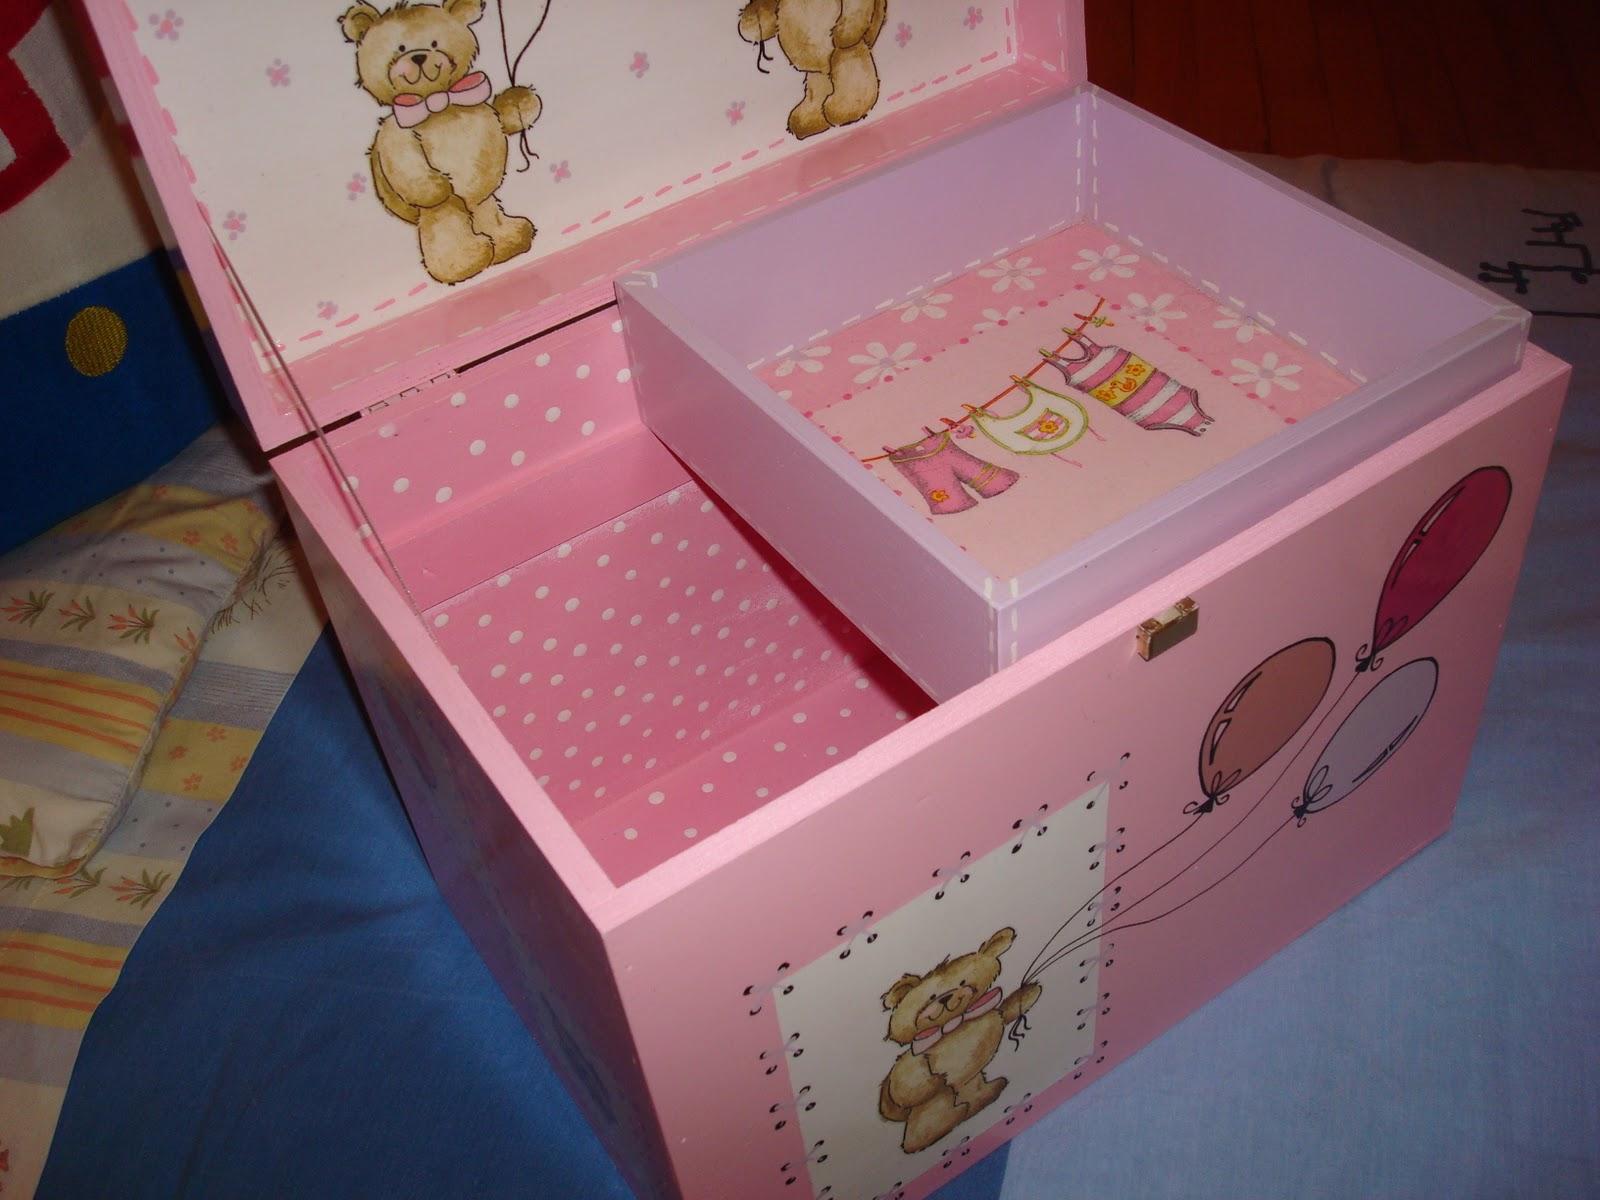 caixa de medicamentos ou necessaire caixa de madeira tintas acrilicas  #93384A 1600x1200